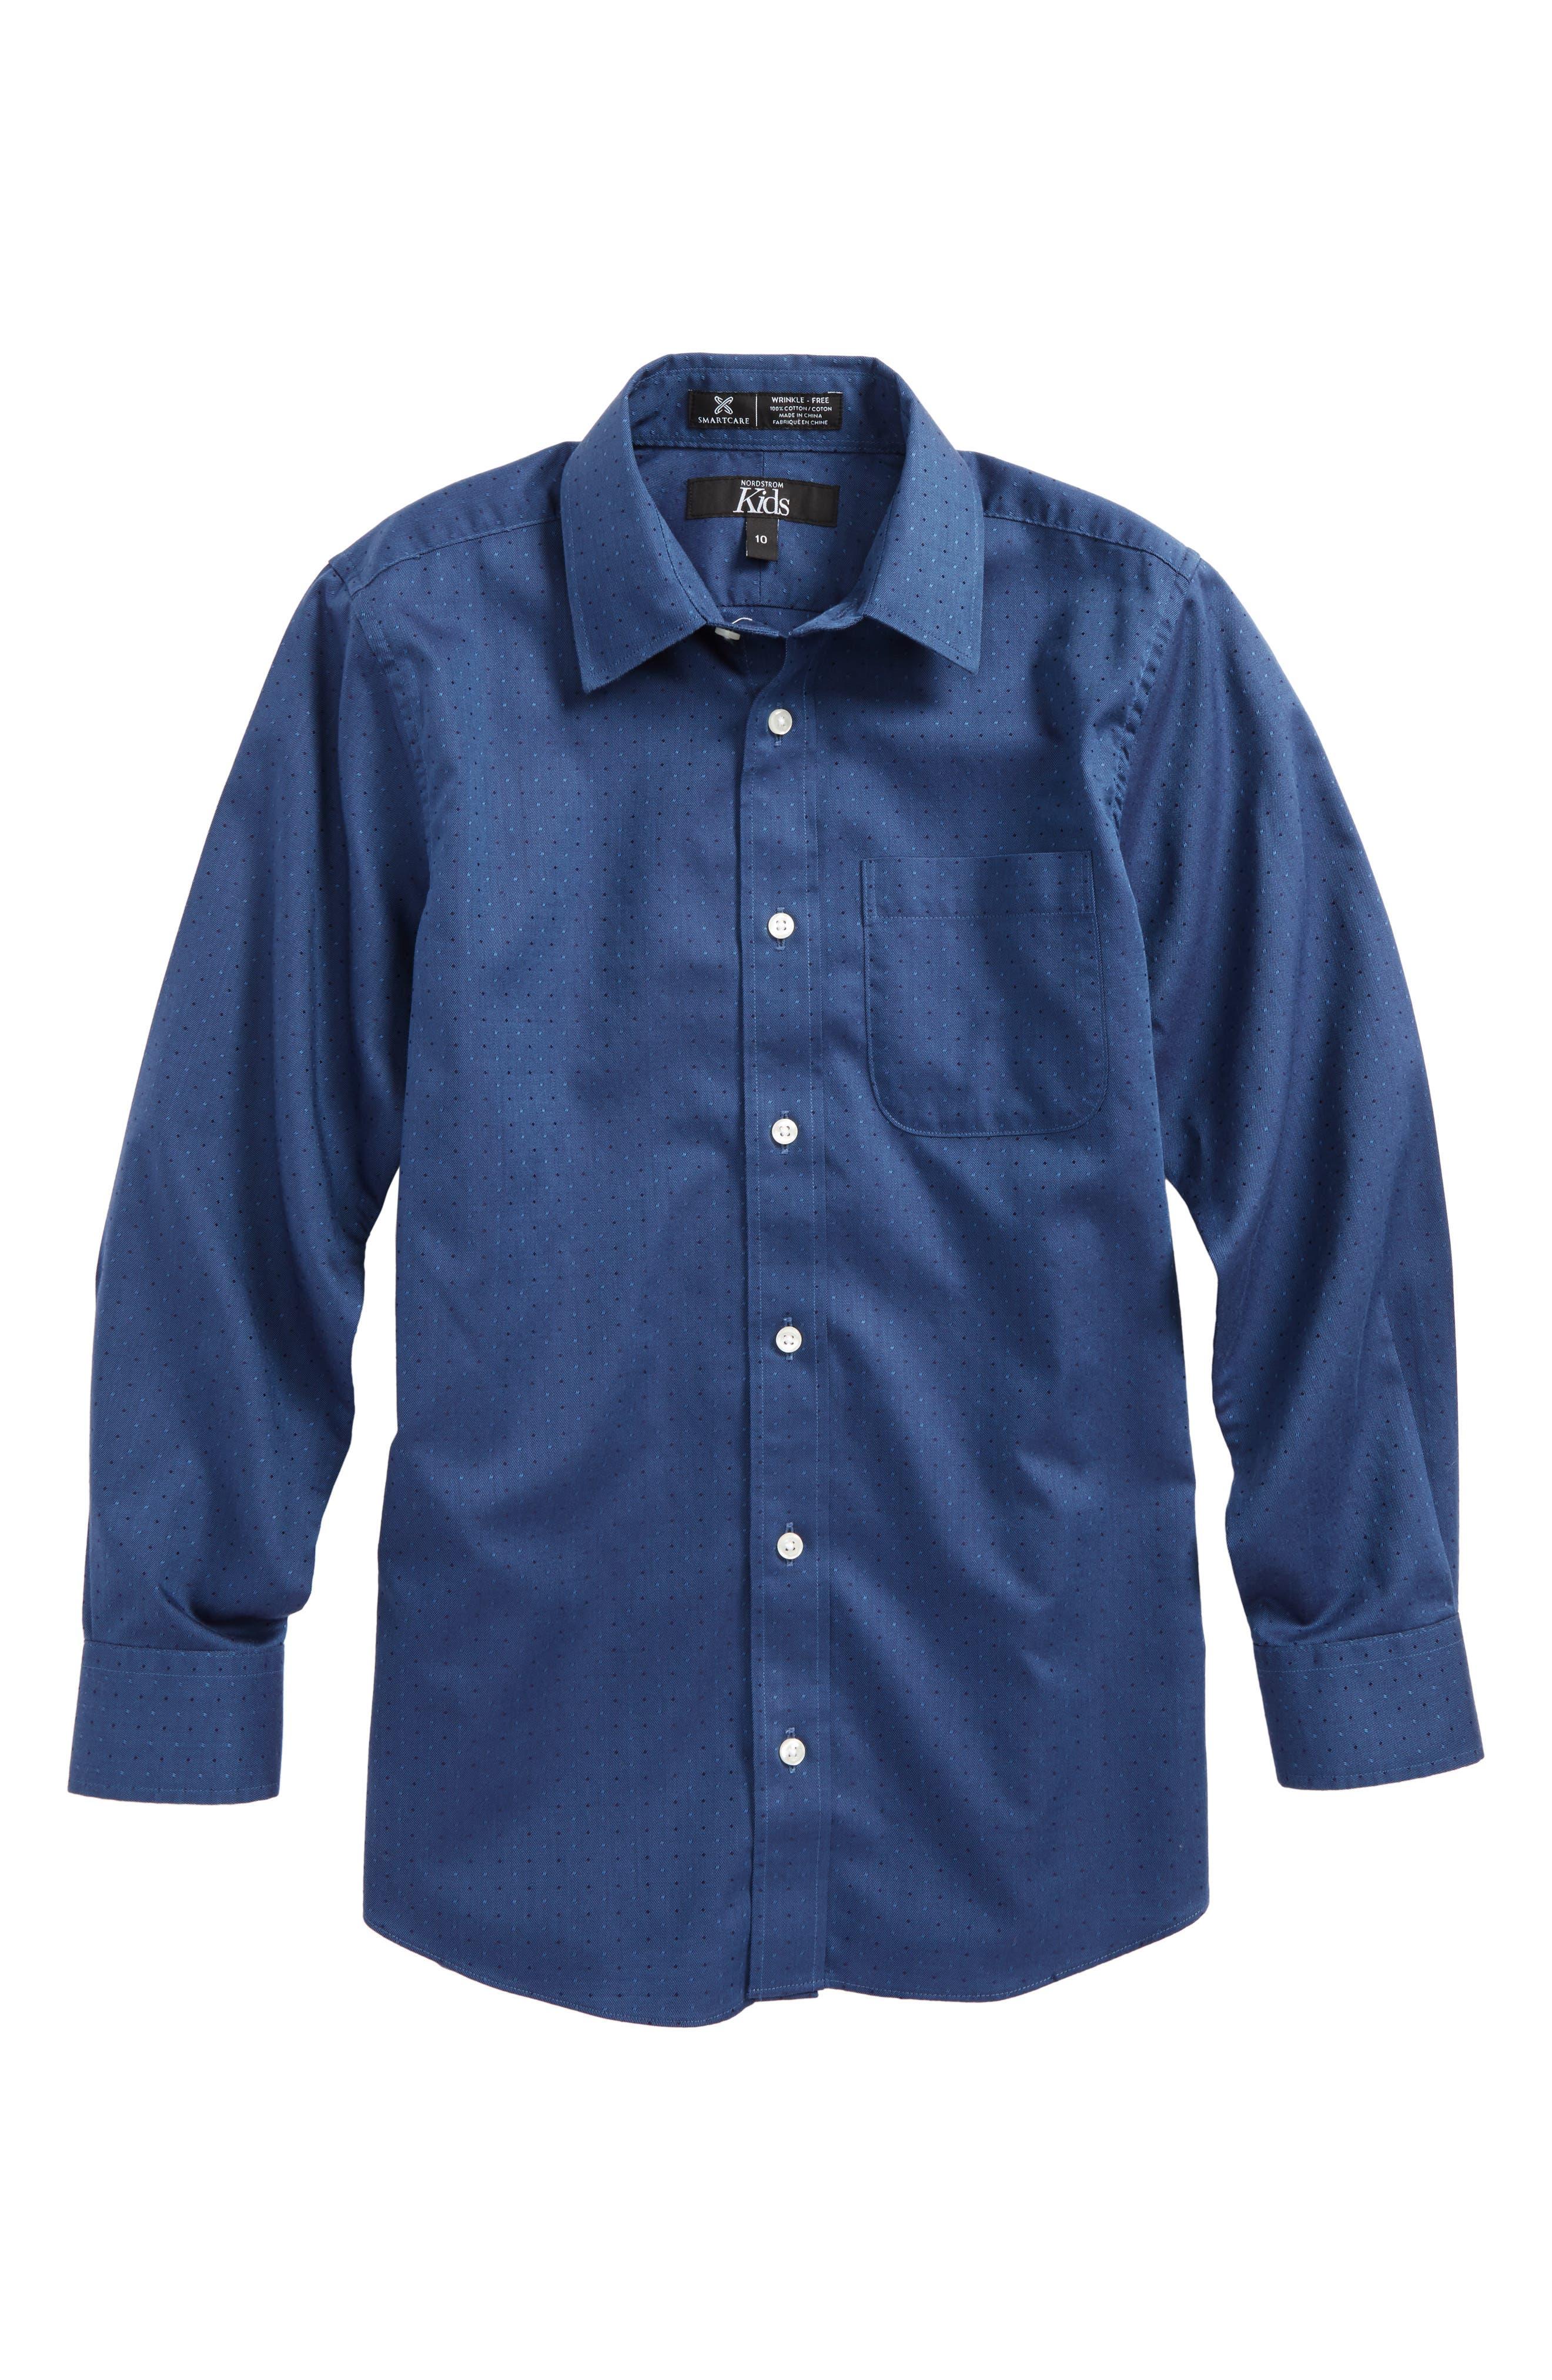 Main Image - Nordstrom Dot Jacquard Sport Shirt (Big Boys)